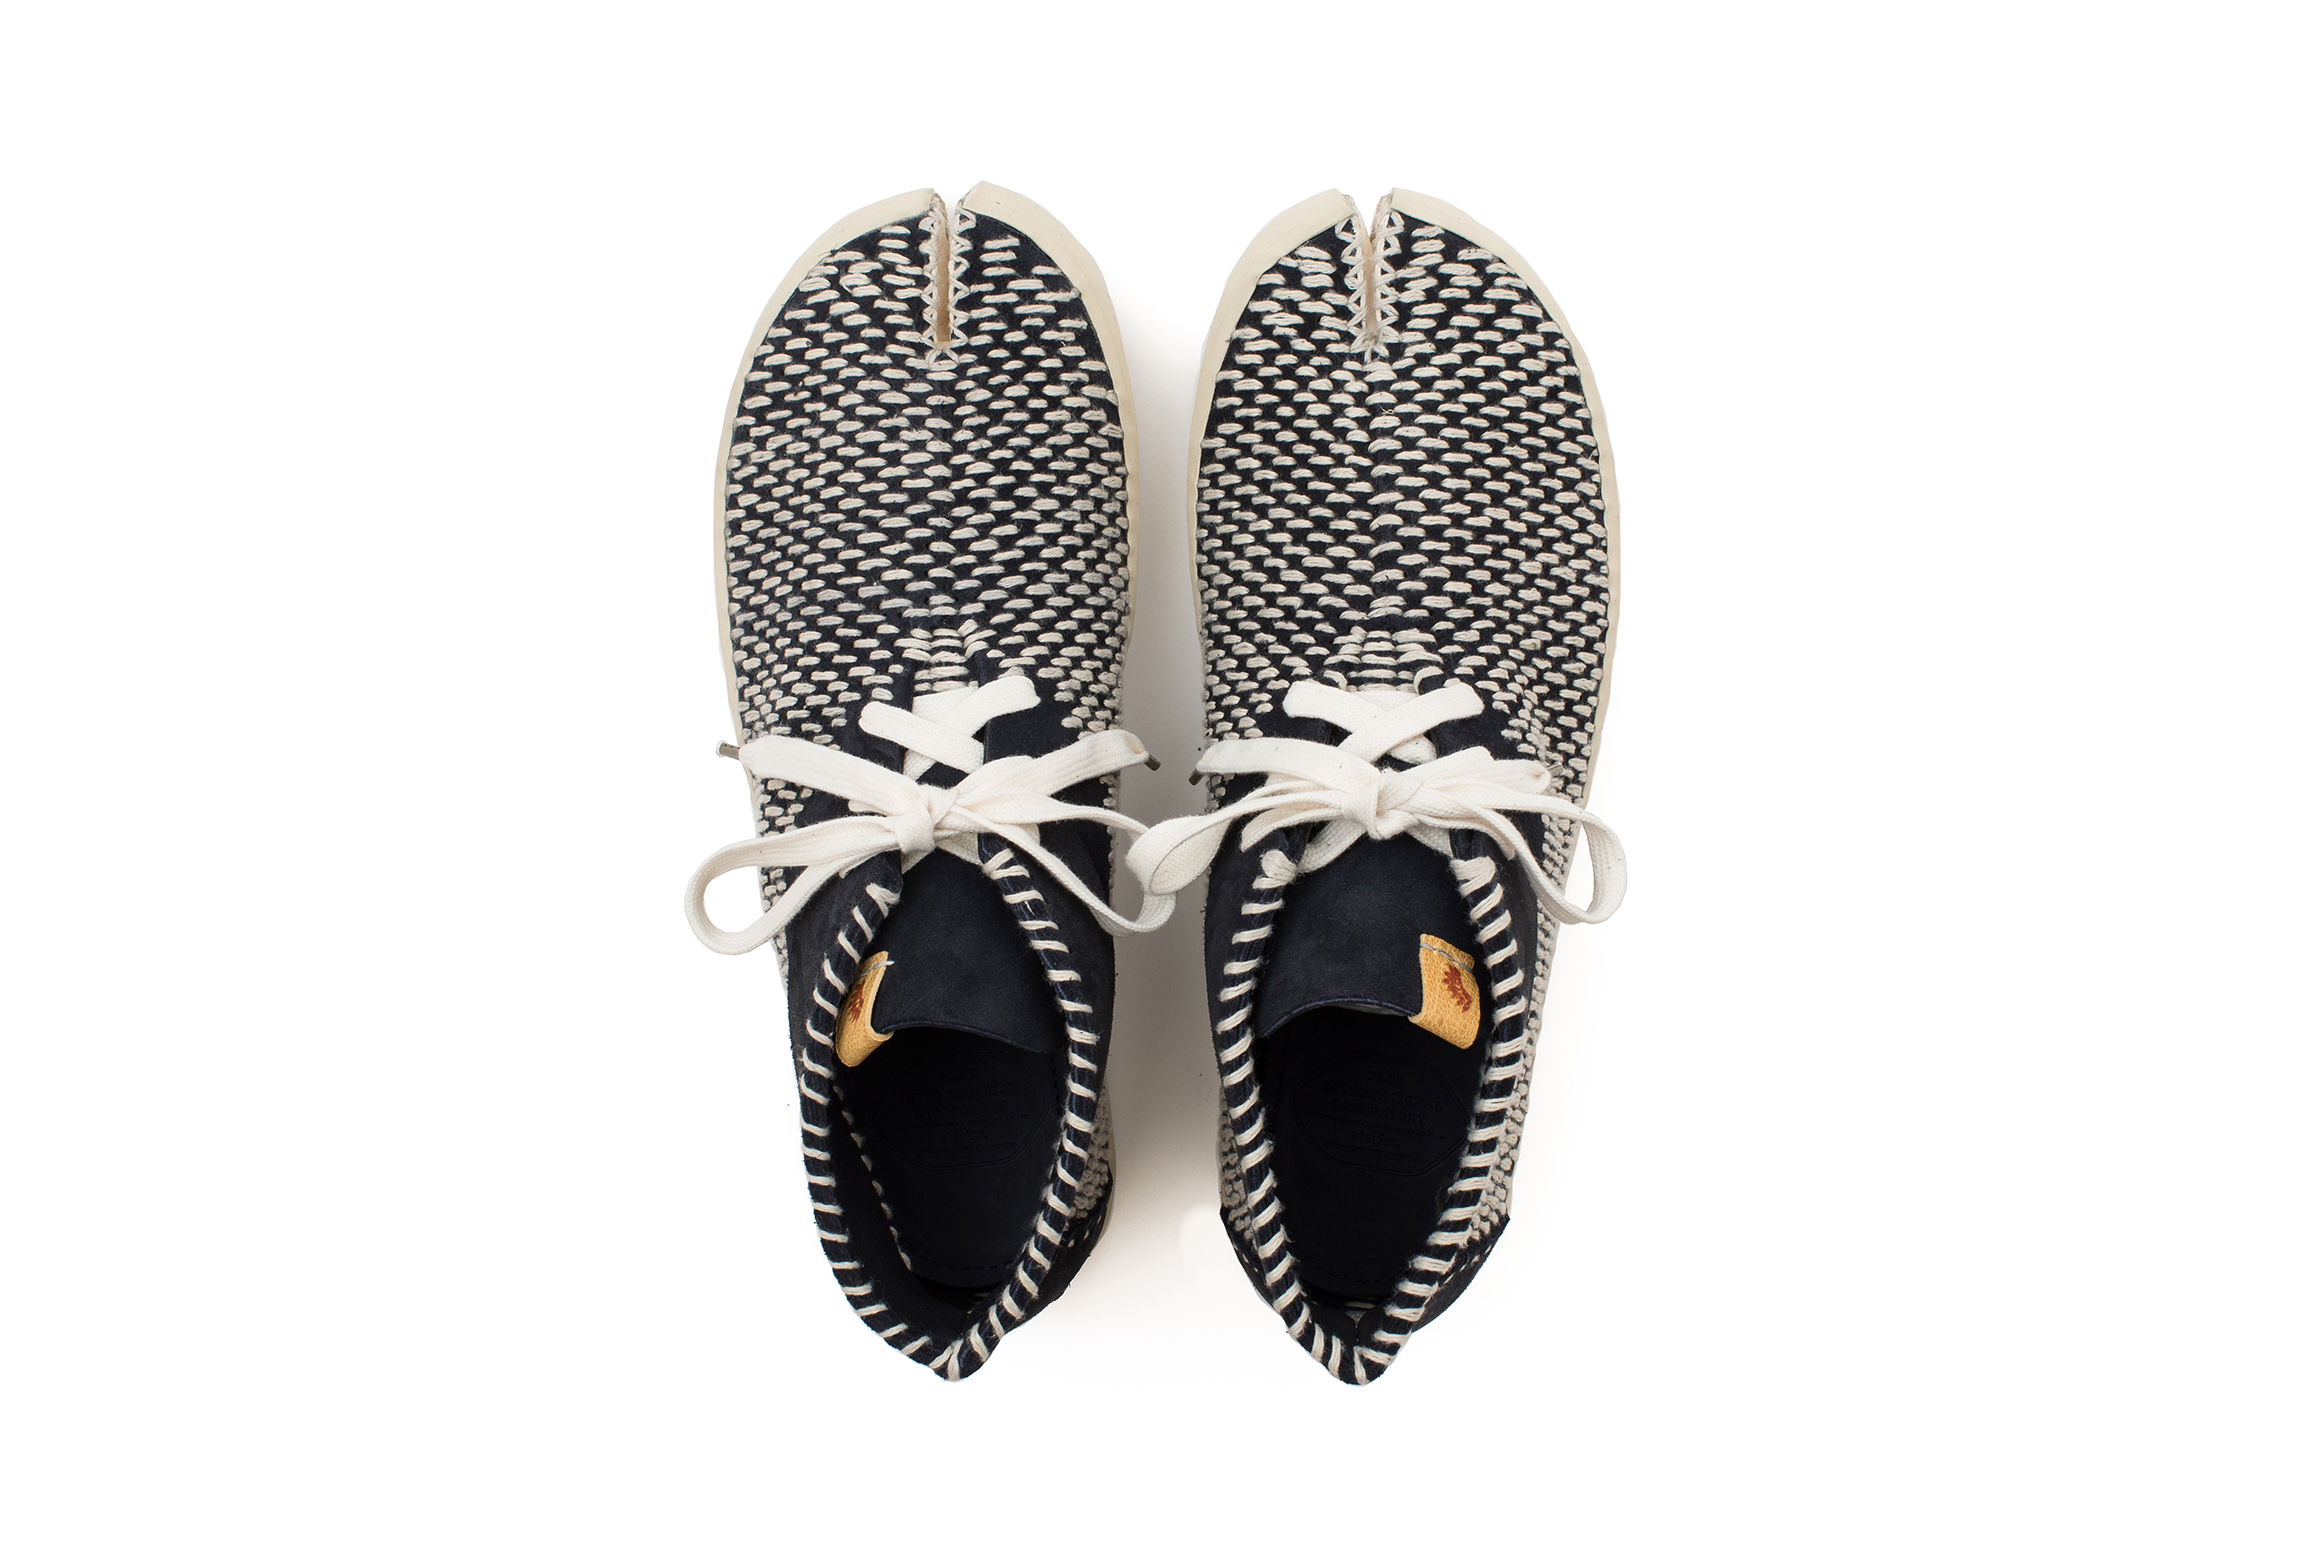 visvim TABI SASHIKO-FOLK Split-Toe Shoe 2017 Release - 600455